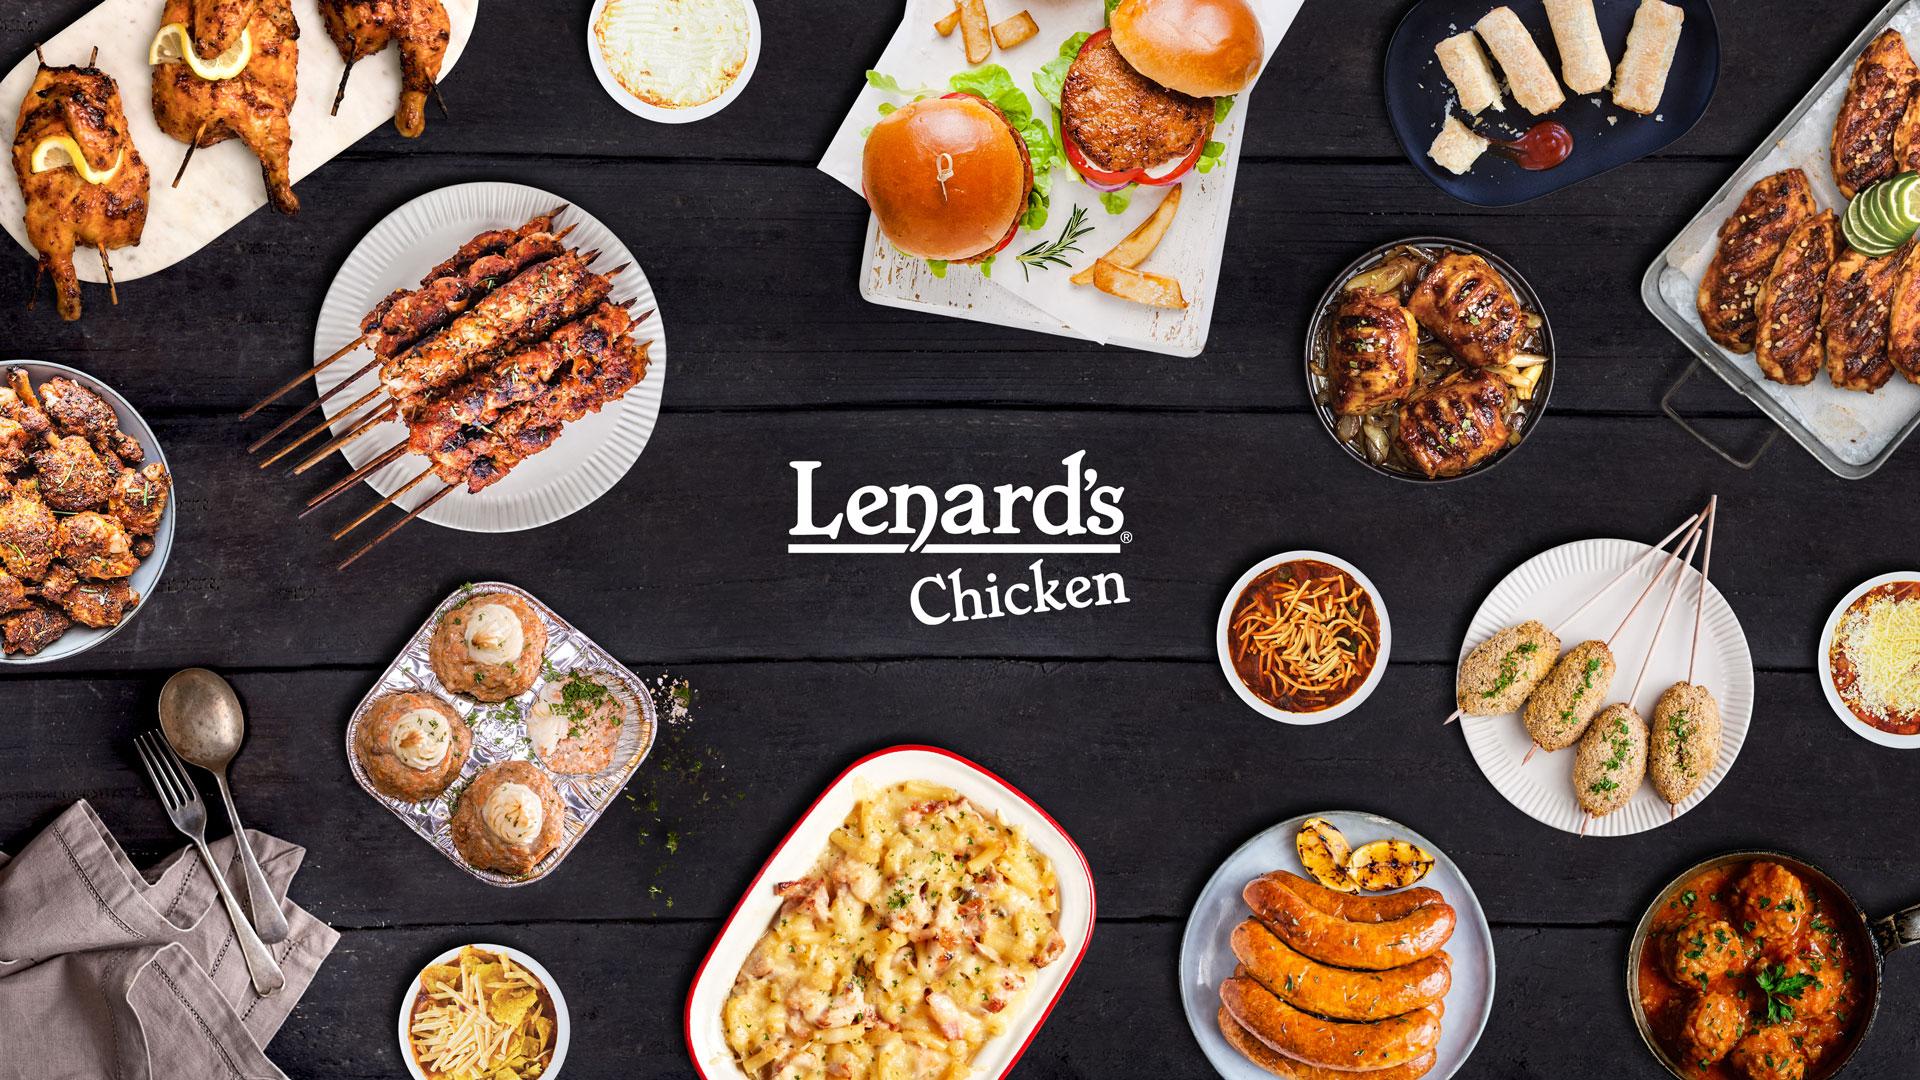 lenards-chicken-townsville-existing-store-opportunities-2